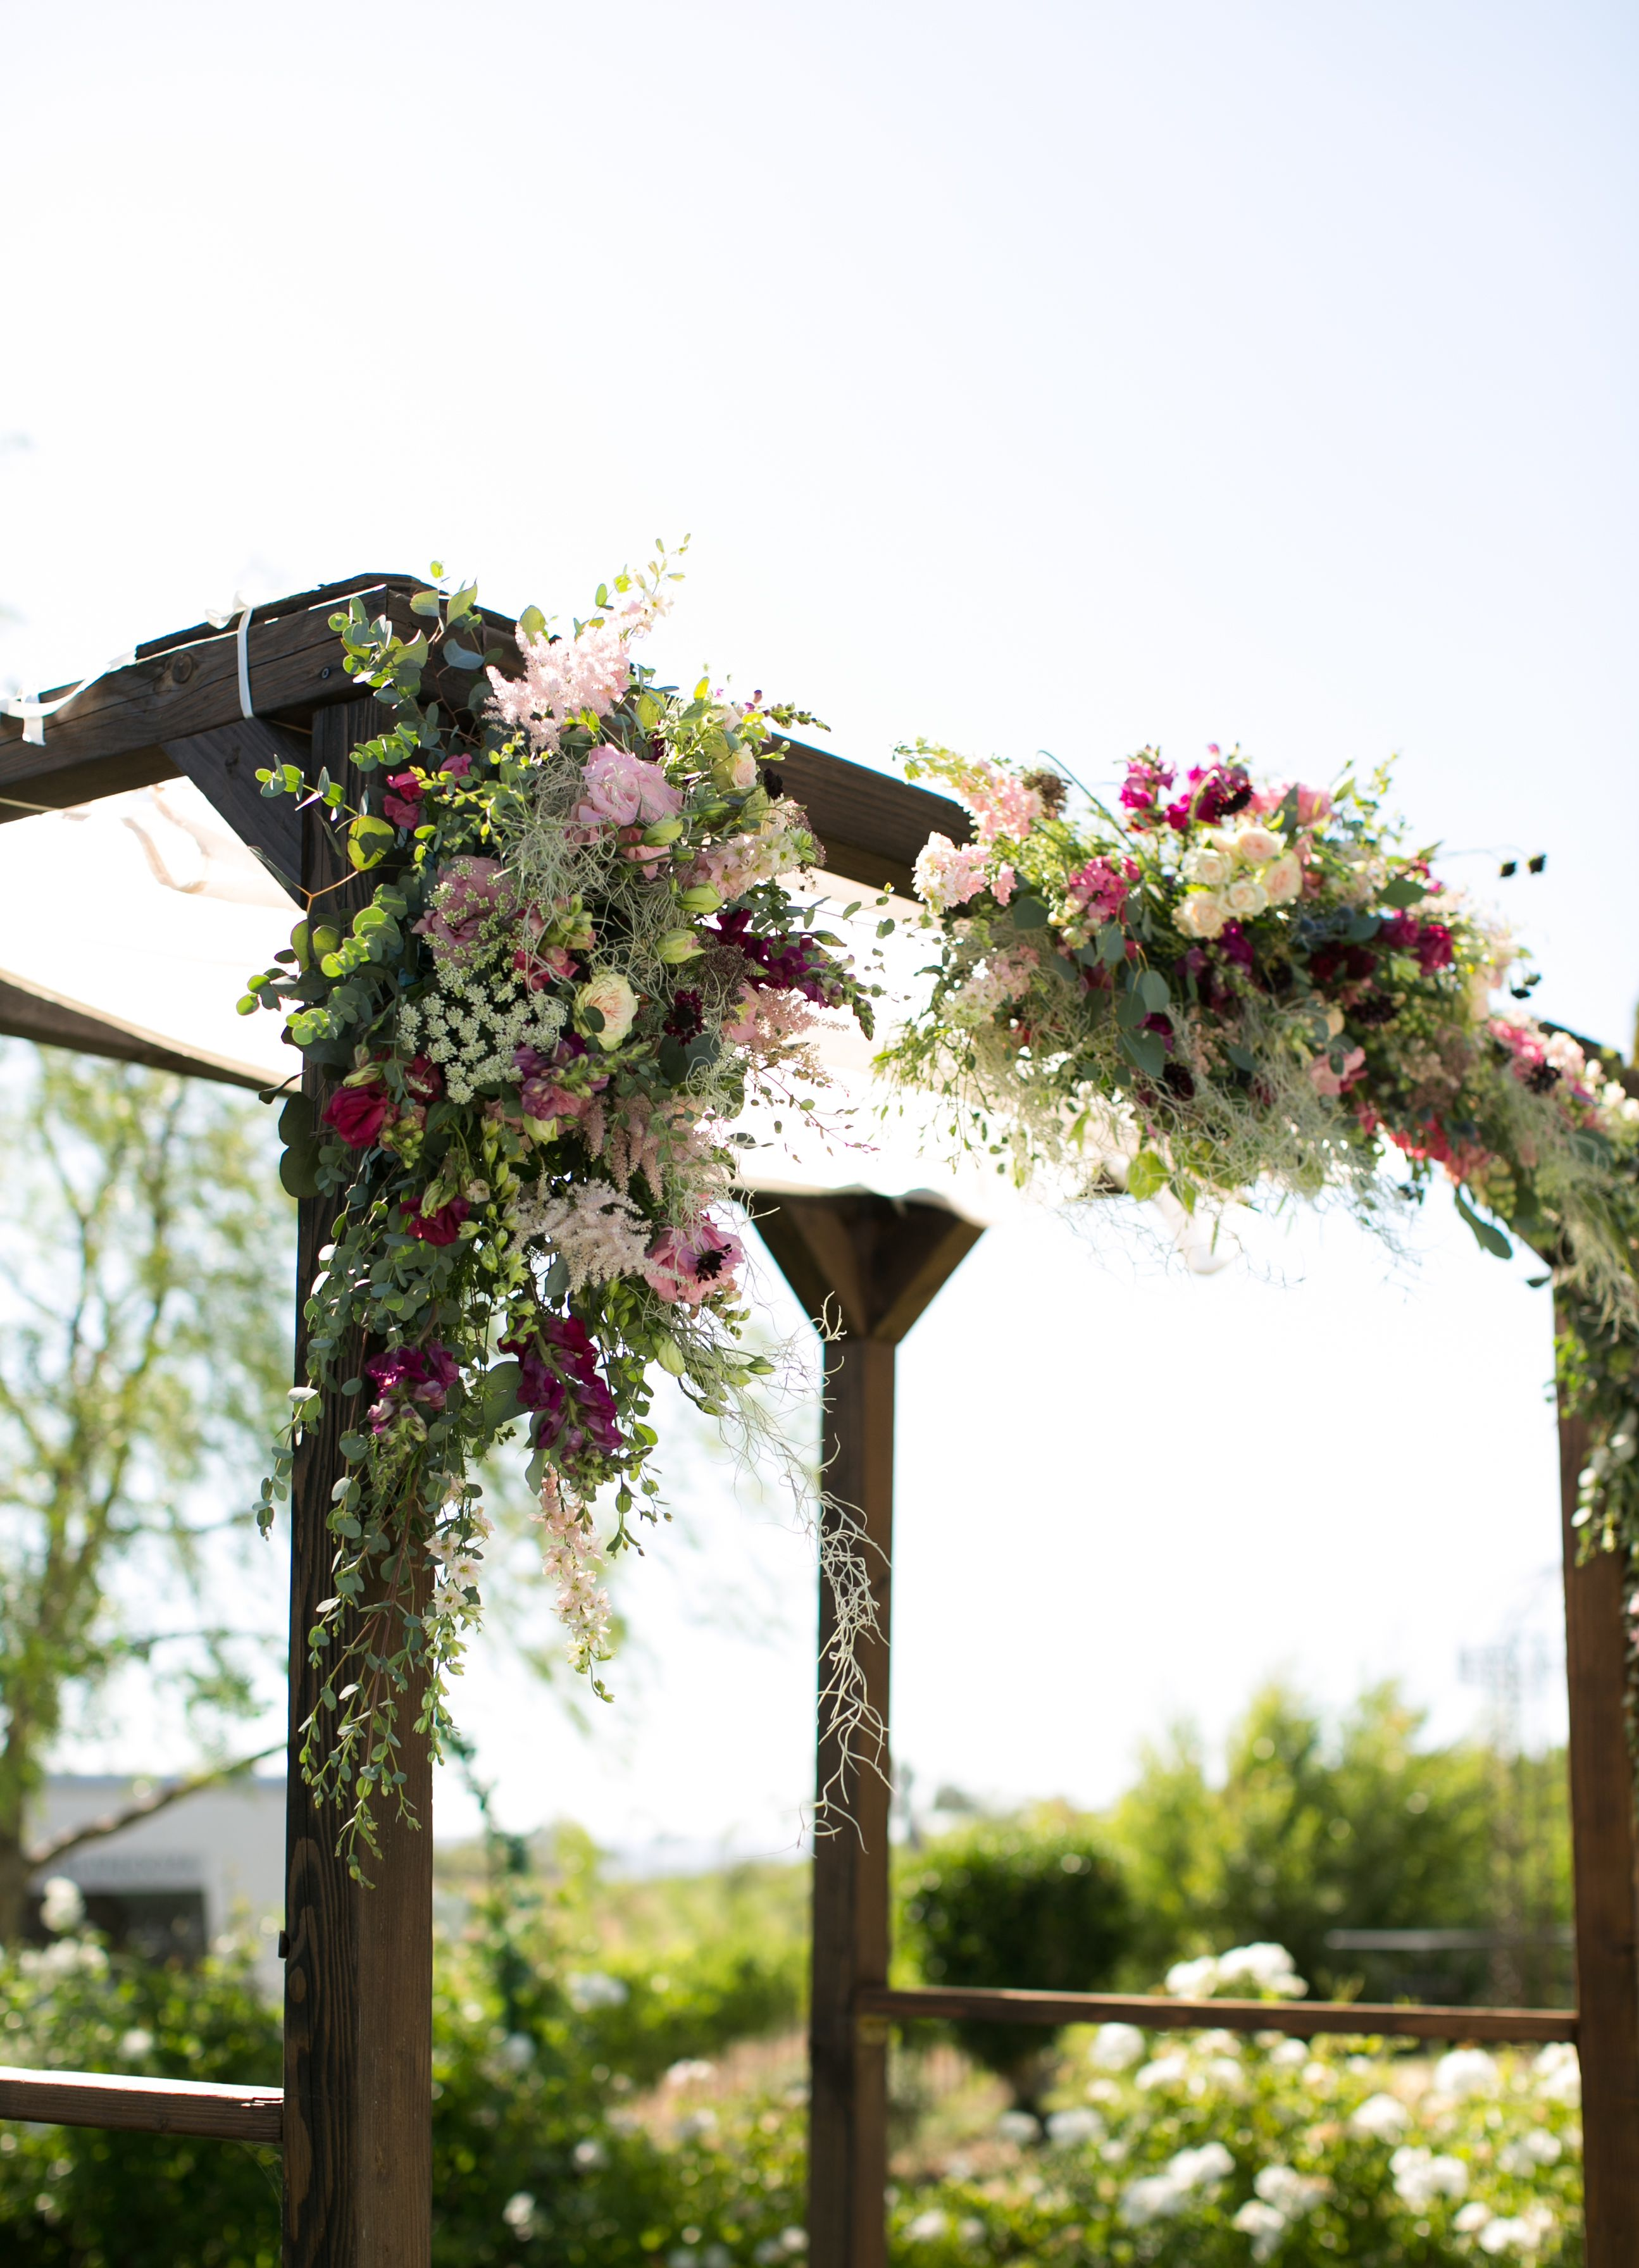 Wedding Arch Jewish Chuppah Coordinated Events By Ari Photo Jeff Thomas Vertexphotography Location Setup Falkner Chuppah Wine Country Wedding Wedding Arch